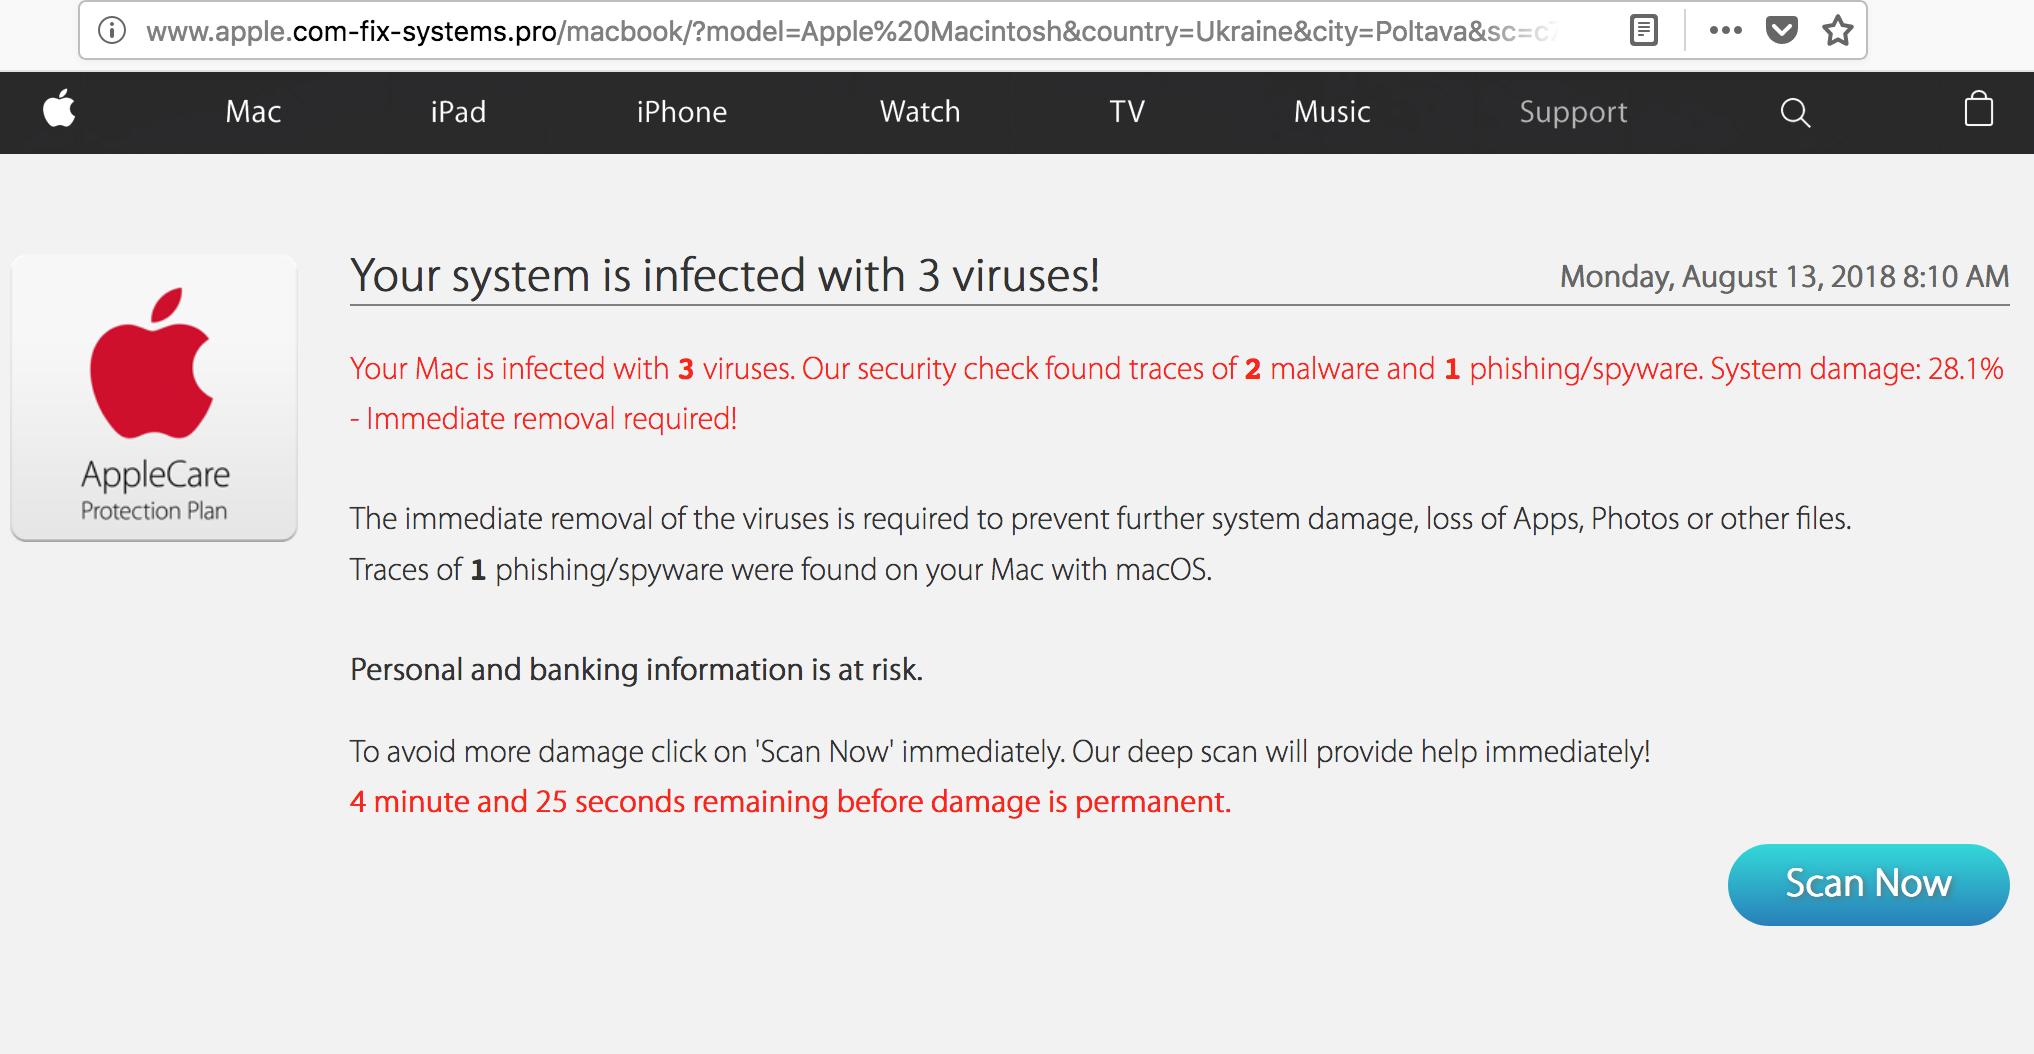 Apple.com-fix-systems.pro virus alert